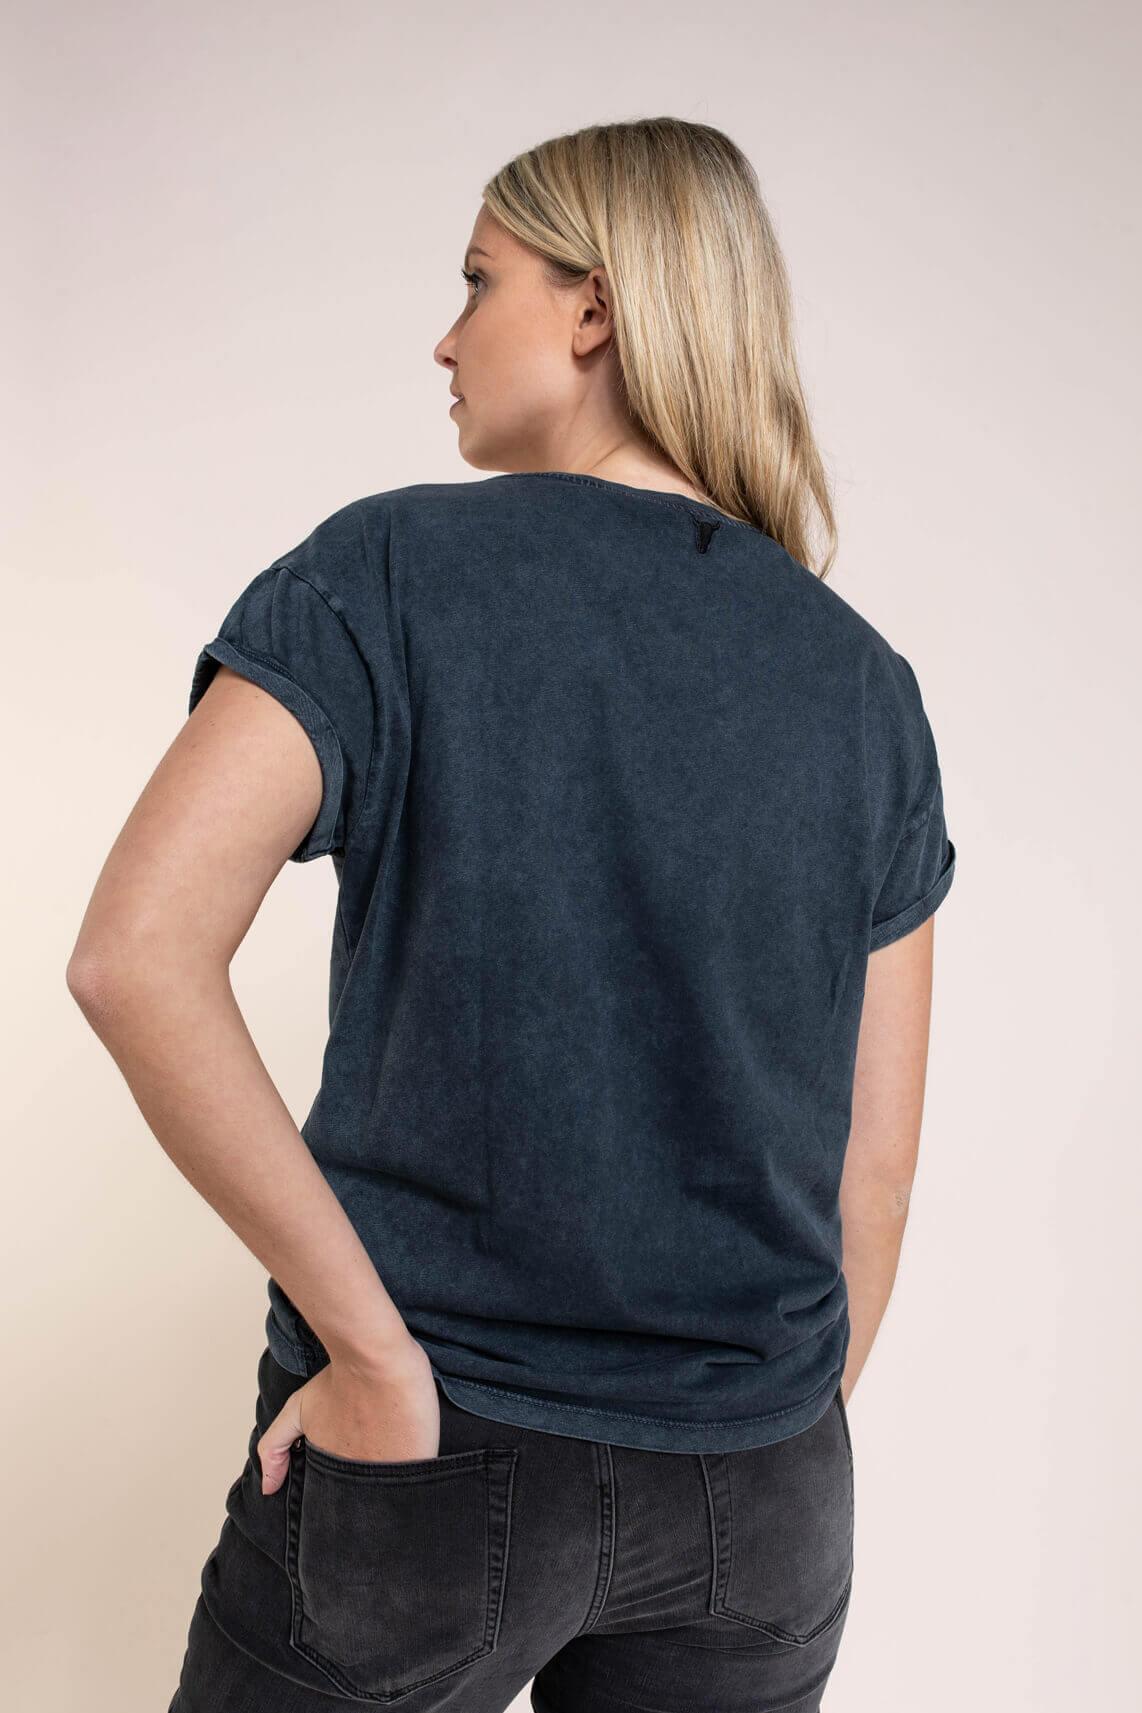 Alix The Label Dames Boxy shirt Zwart